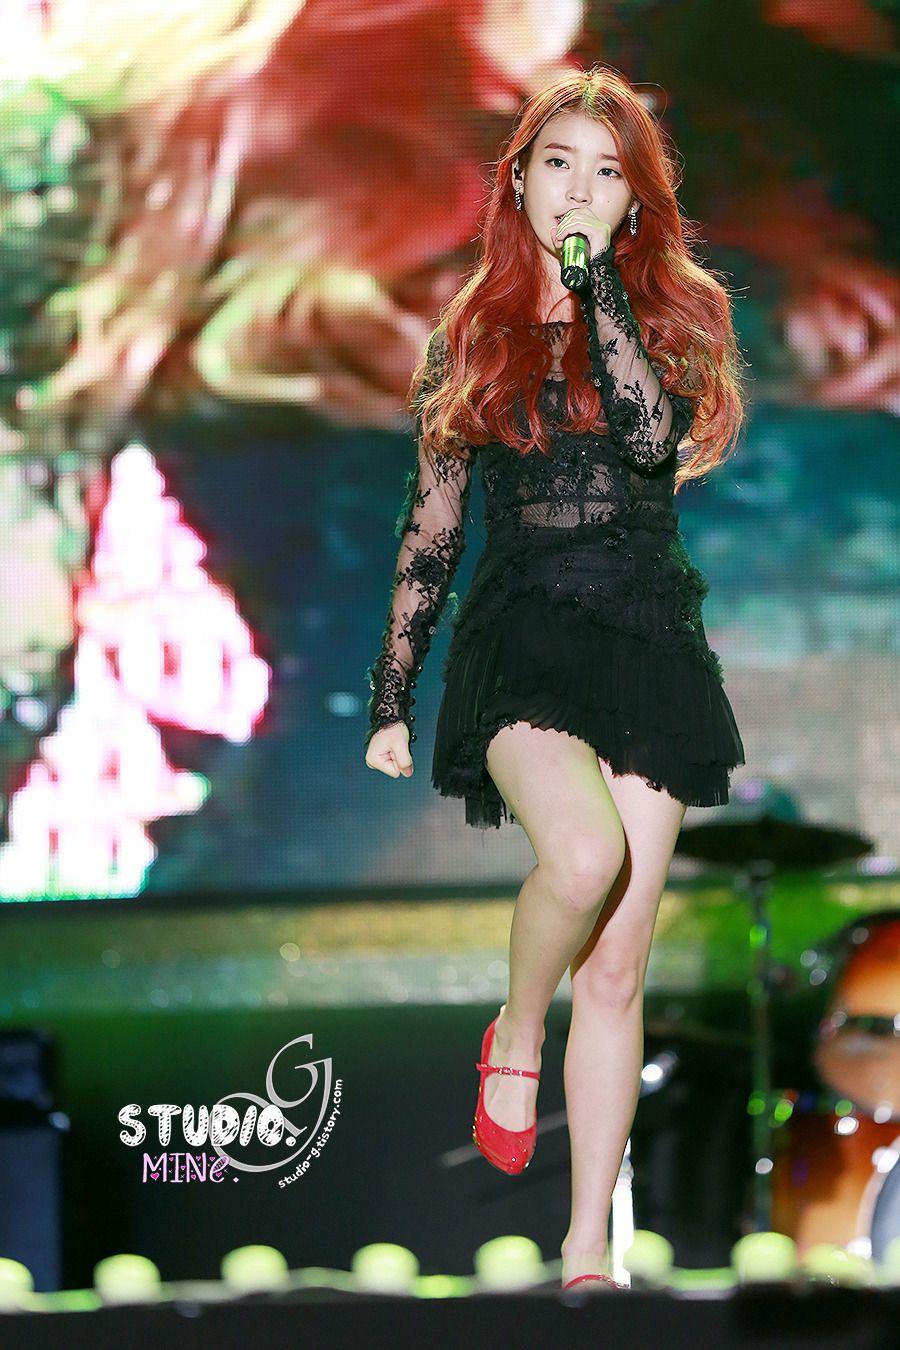 IU Lee_Ji_Eun에 있는 ByWizard님의 핀   아름다운 유명인, 여성 얼굴, 연예인